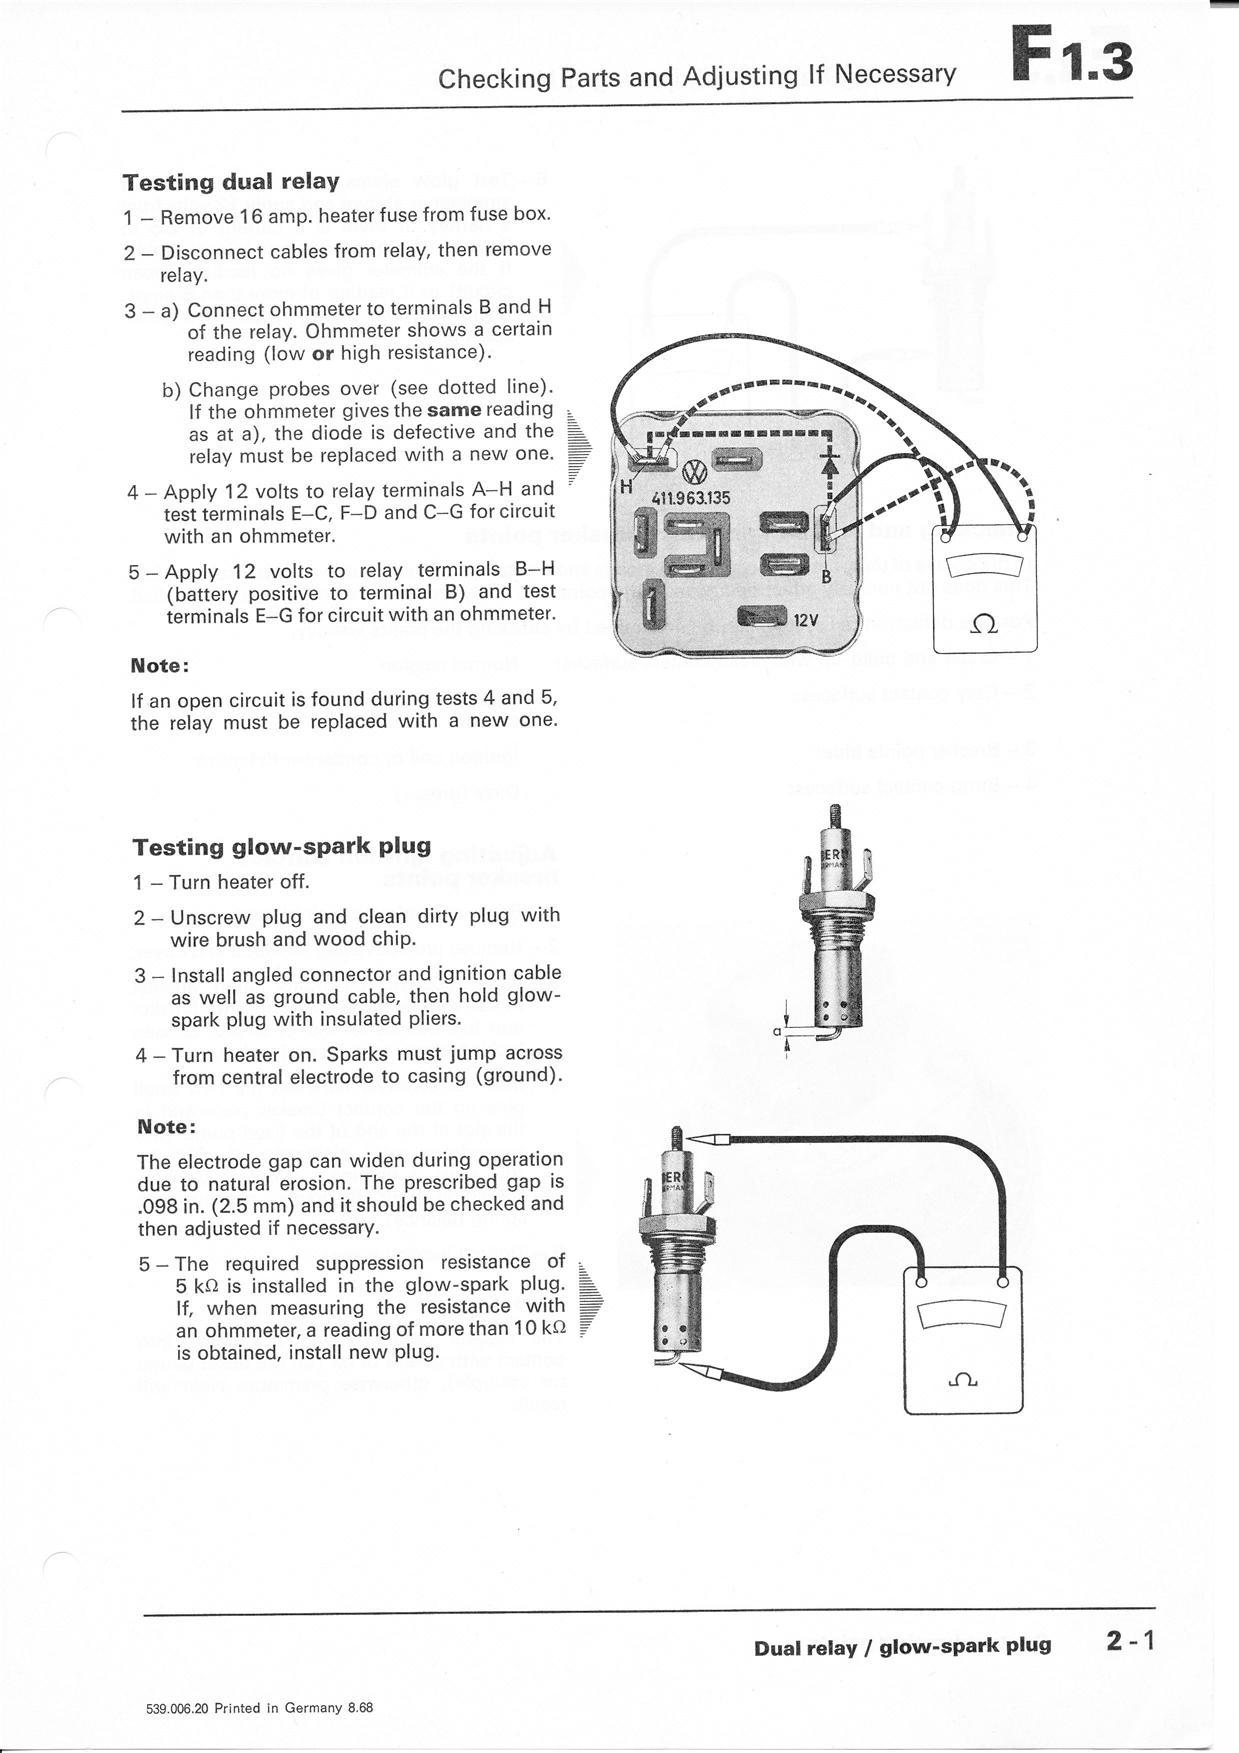 Ammeter Gauge Wiring Http Wwwthesambacom Vw Archives Manuals 12 Volt Diagram Thesamba Com Volkswagen Shop Manual Fresh Air Heating And